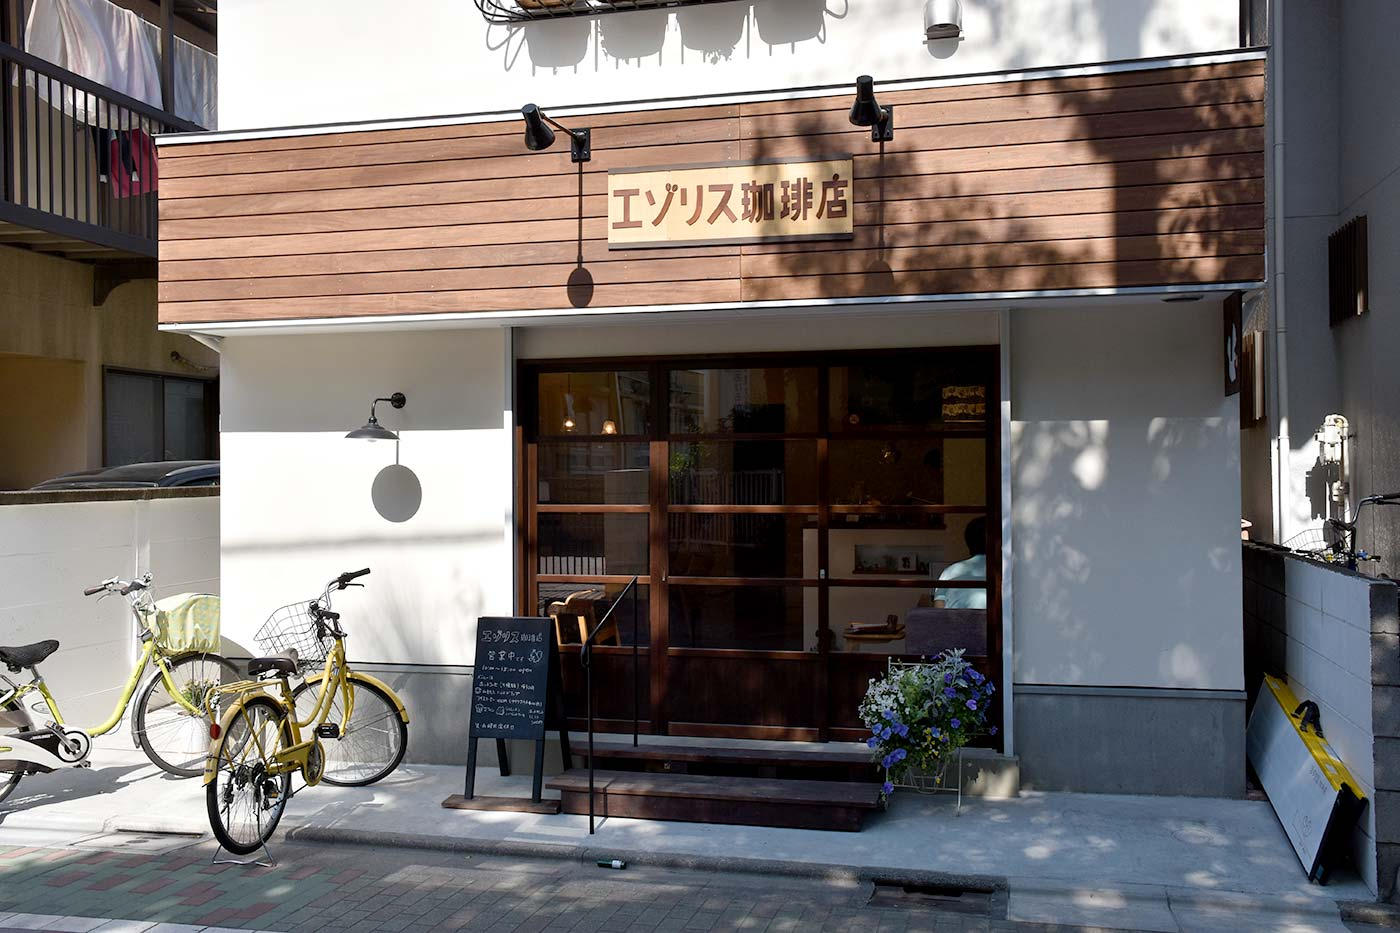 kanamachi_023